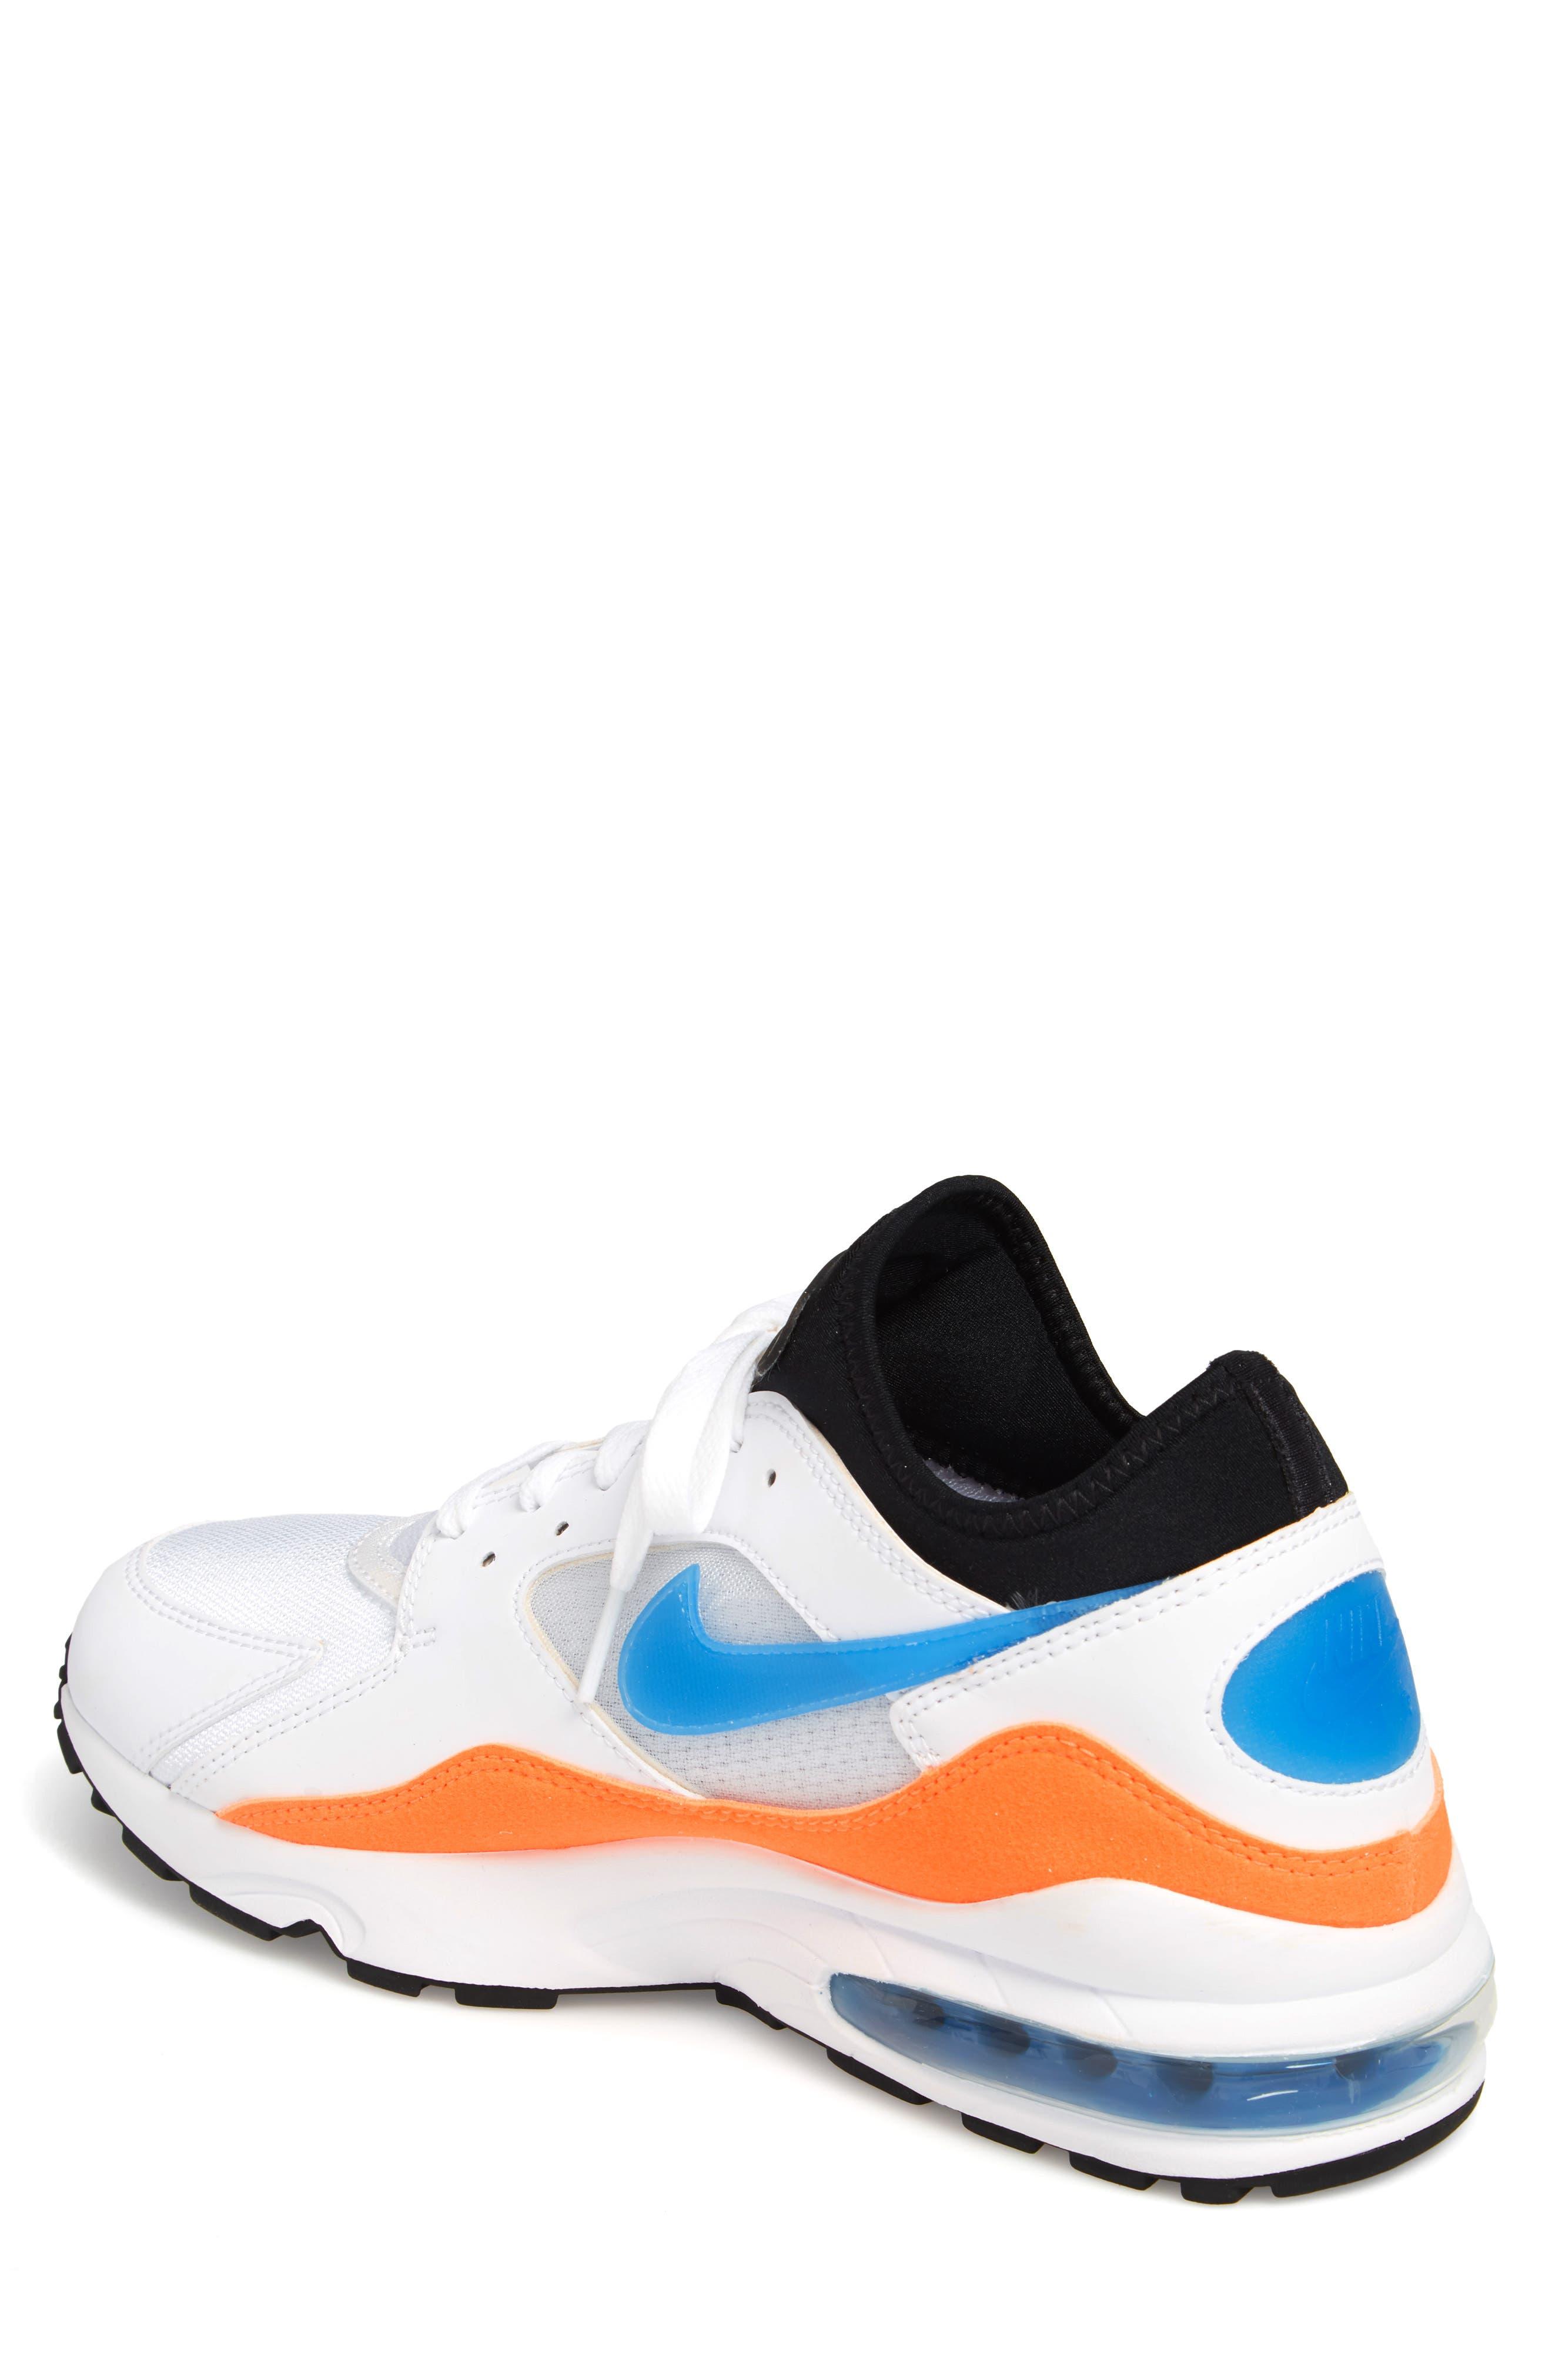 Air Max 93 Sneaker,                             Alternate thumbnail 2, color,                             White/ Blue Nebula/ Orange